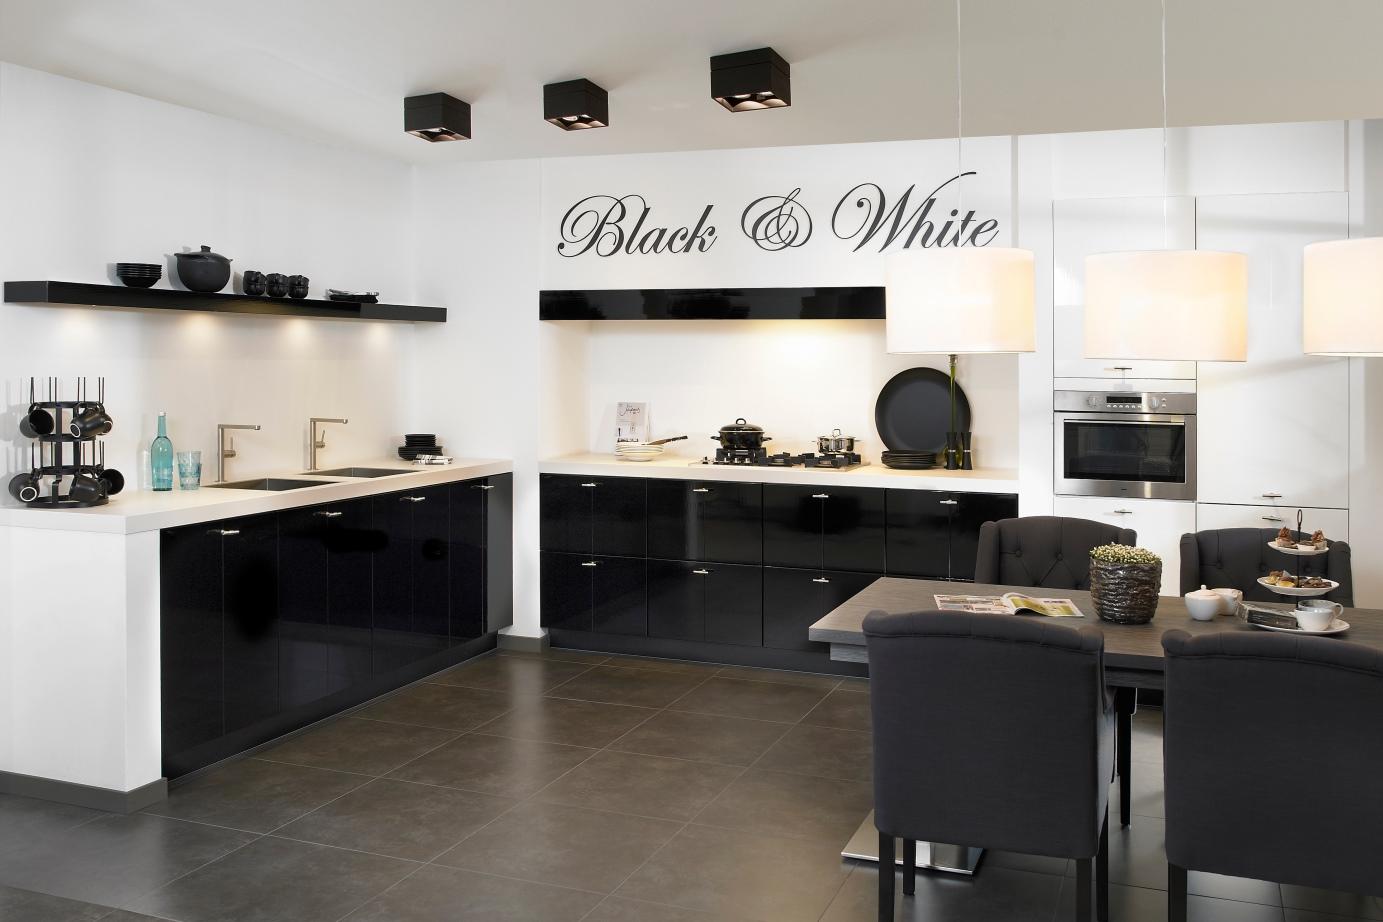 Luxe Design Keuken : Luxe keukens hoogste kwaliteit volledige ontzorging avanti